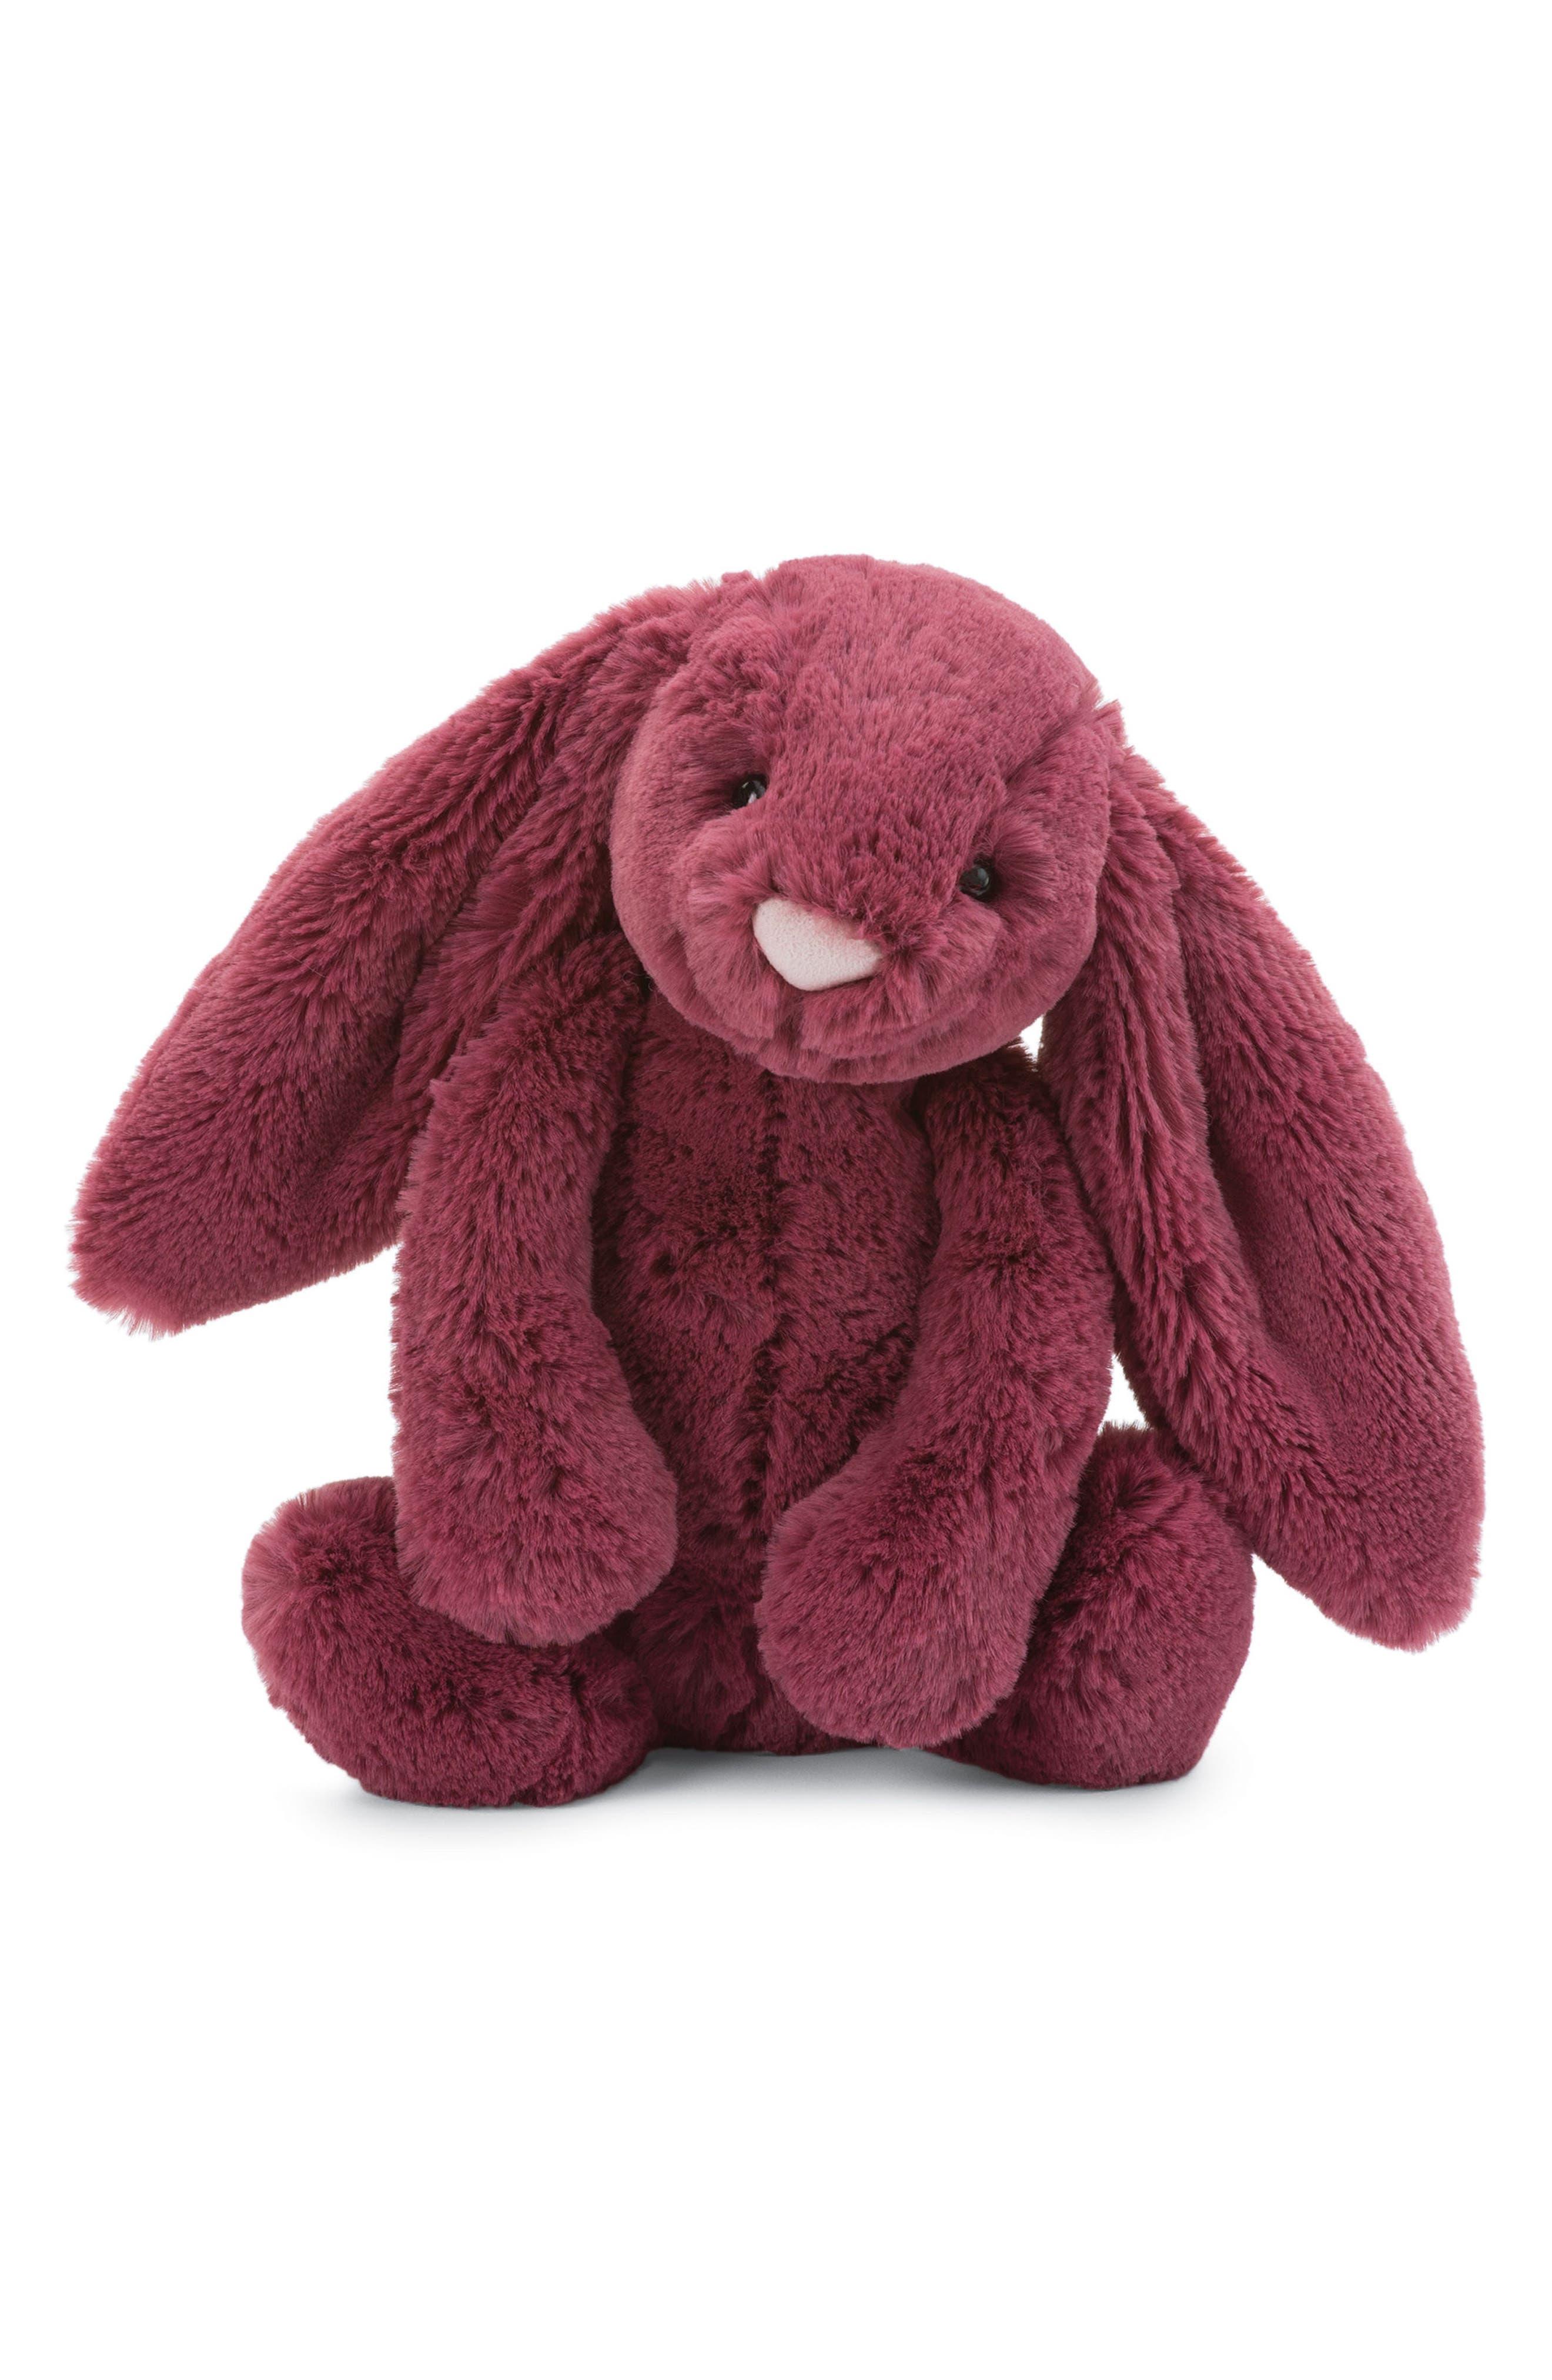 Bashful Berry Bunny Stuffed Animal,                             Main thumbnail 1, color,                             610